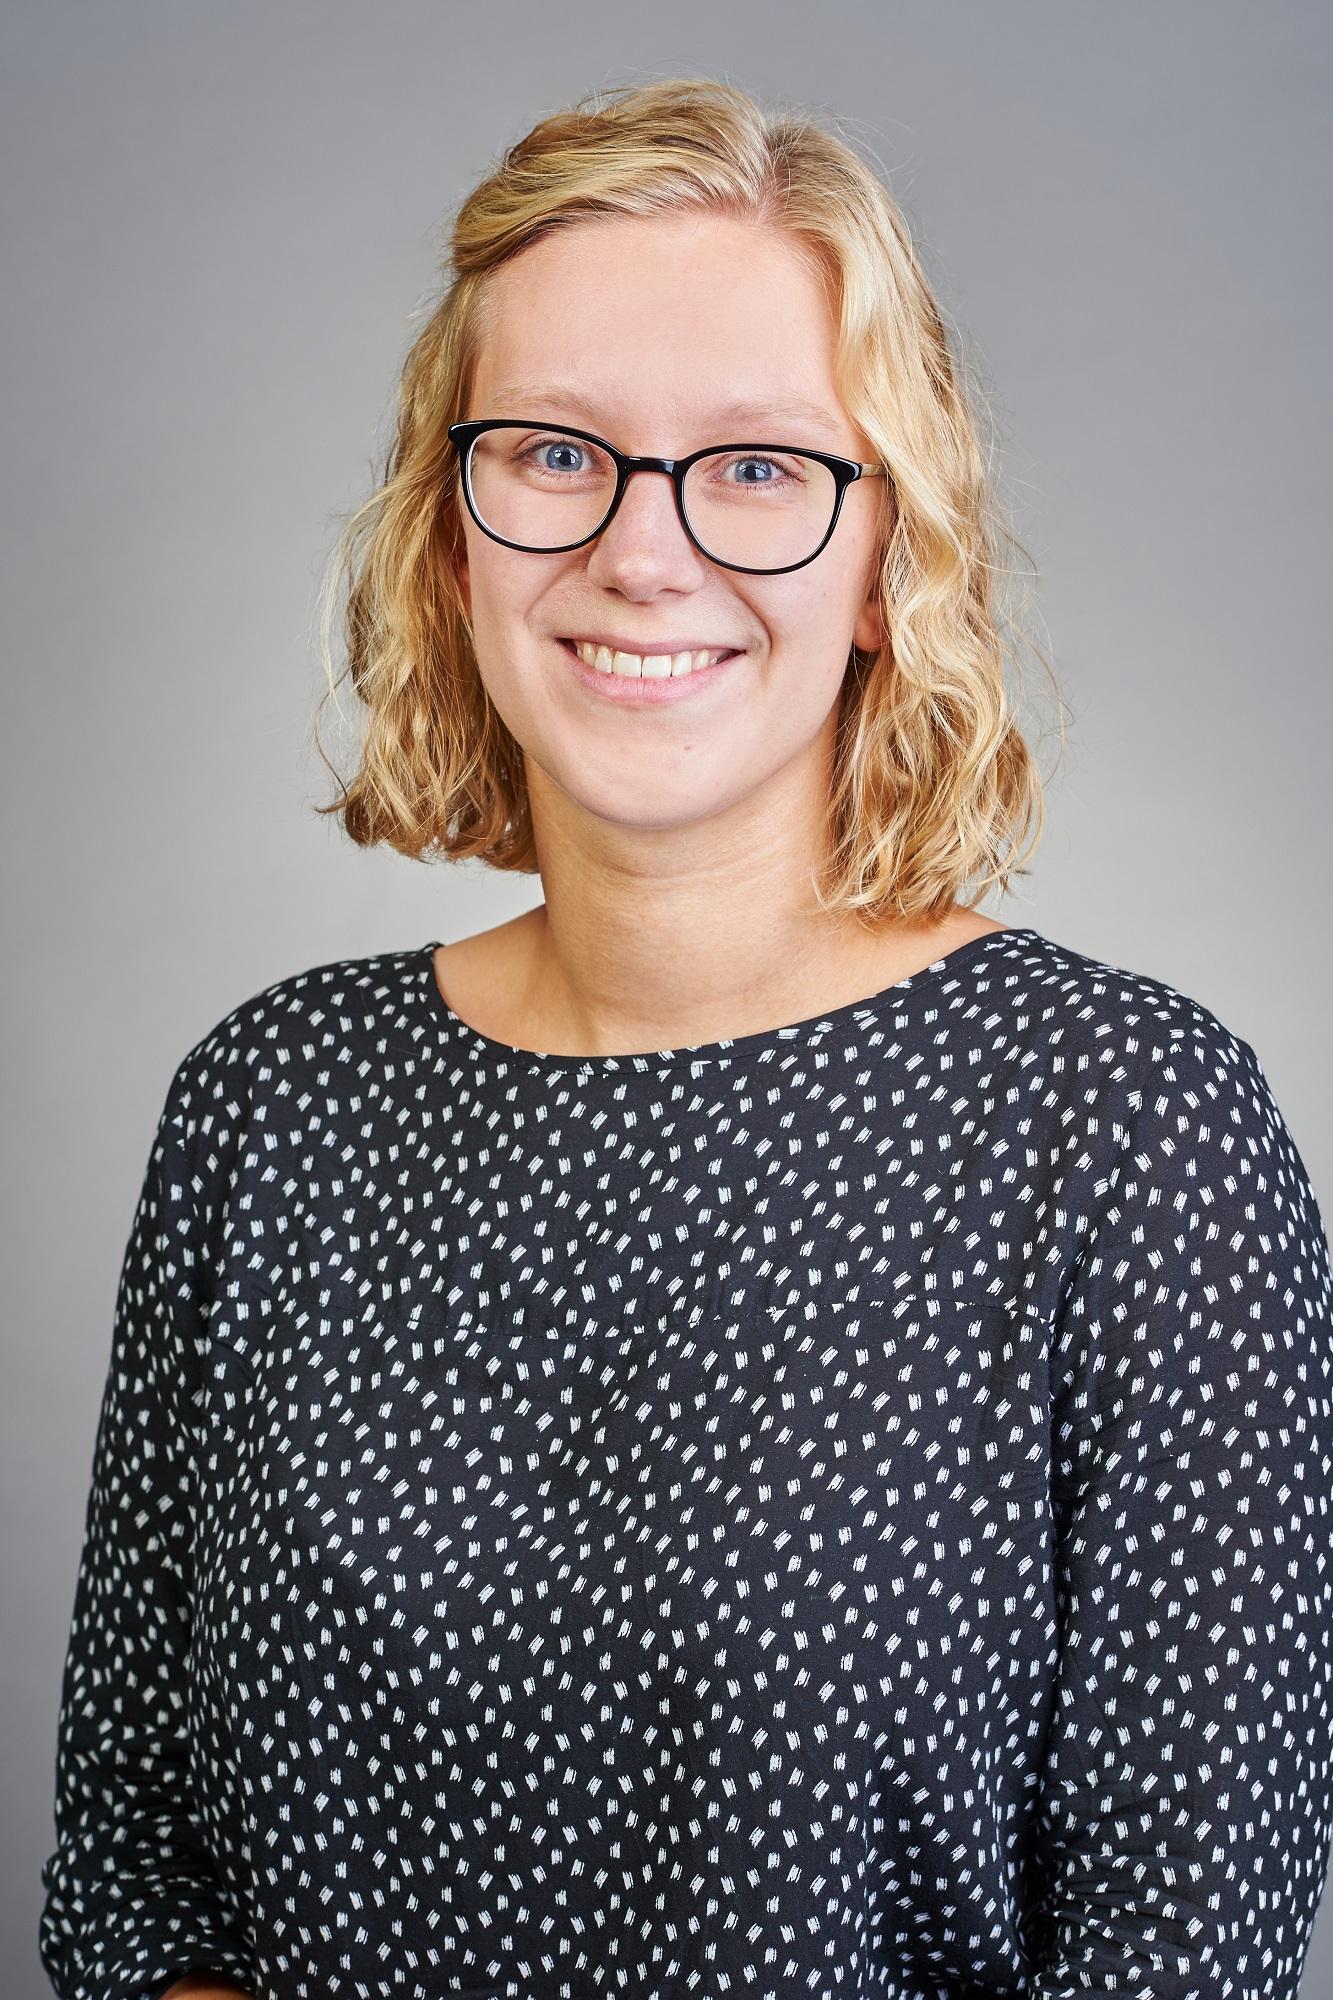 Rebecca-Meier Heilpädagogische Tagesgruppe Buntentor